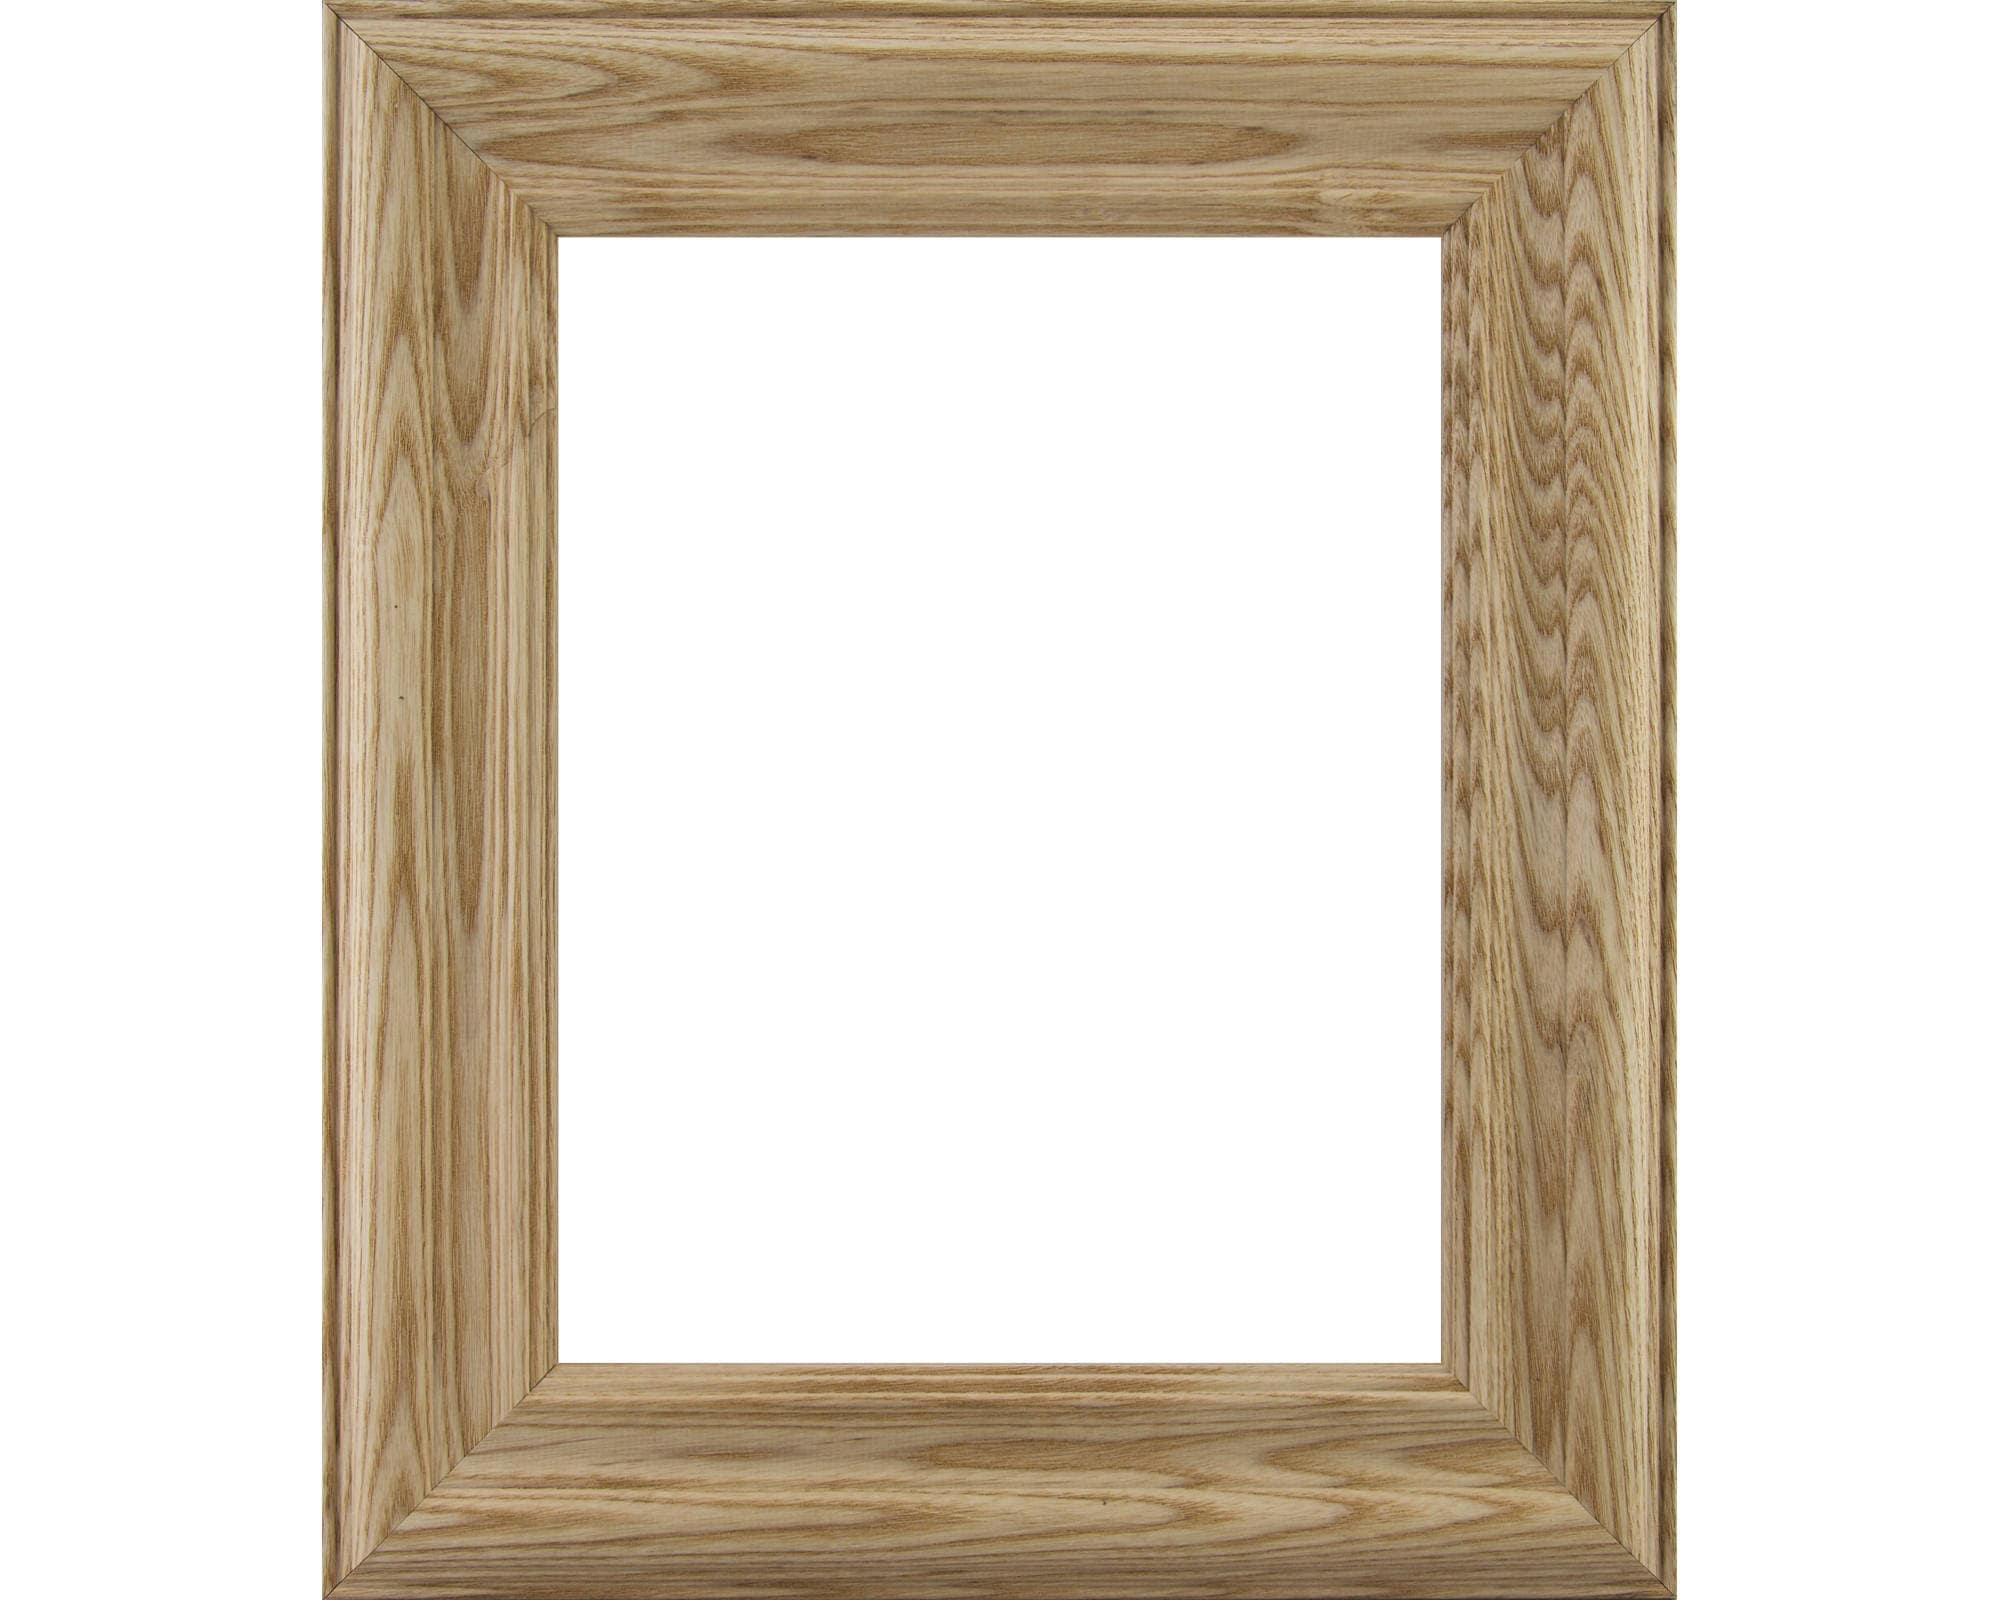 Craig Frames, 20x30 Inch Raw Wood Picture Frame, Wiltshire N, 2 ...